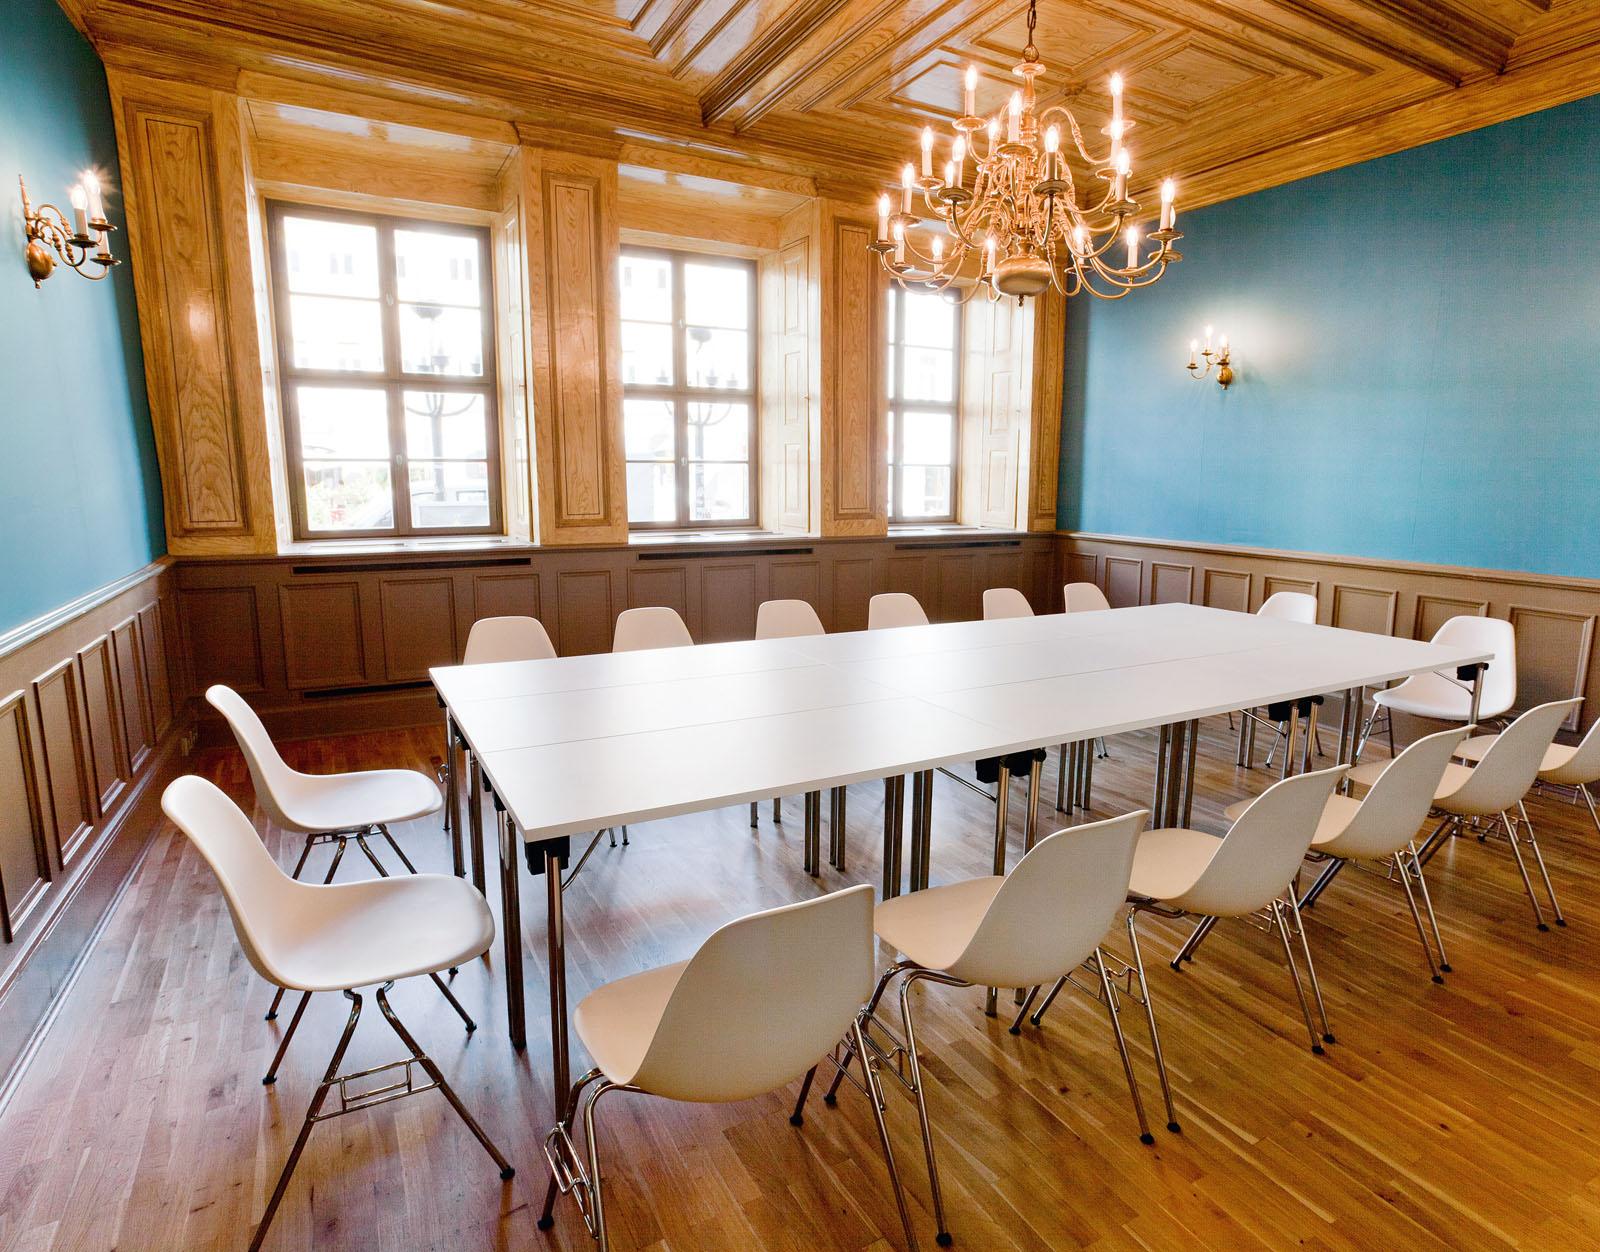 Architekturbüro Erfurt architekturbüro jutta kehr, erfurt, kulturforum haus dacheröden